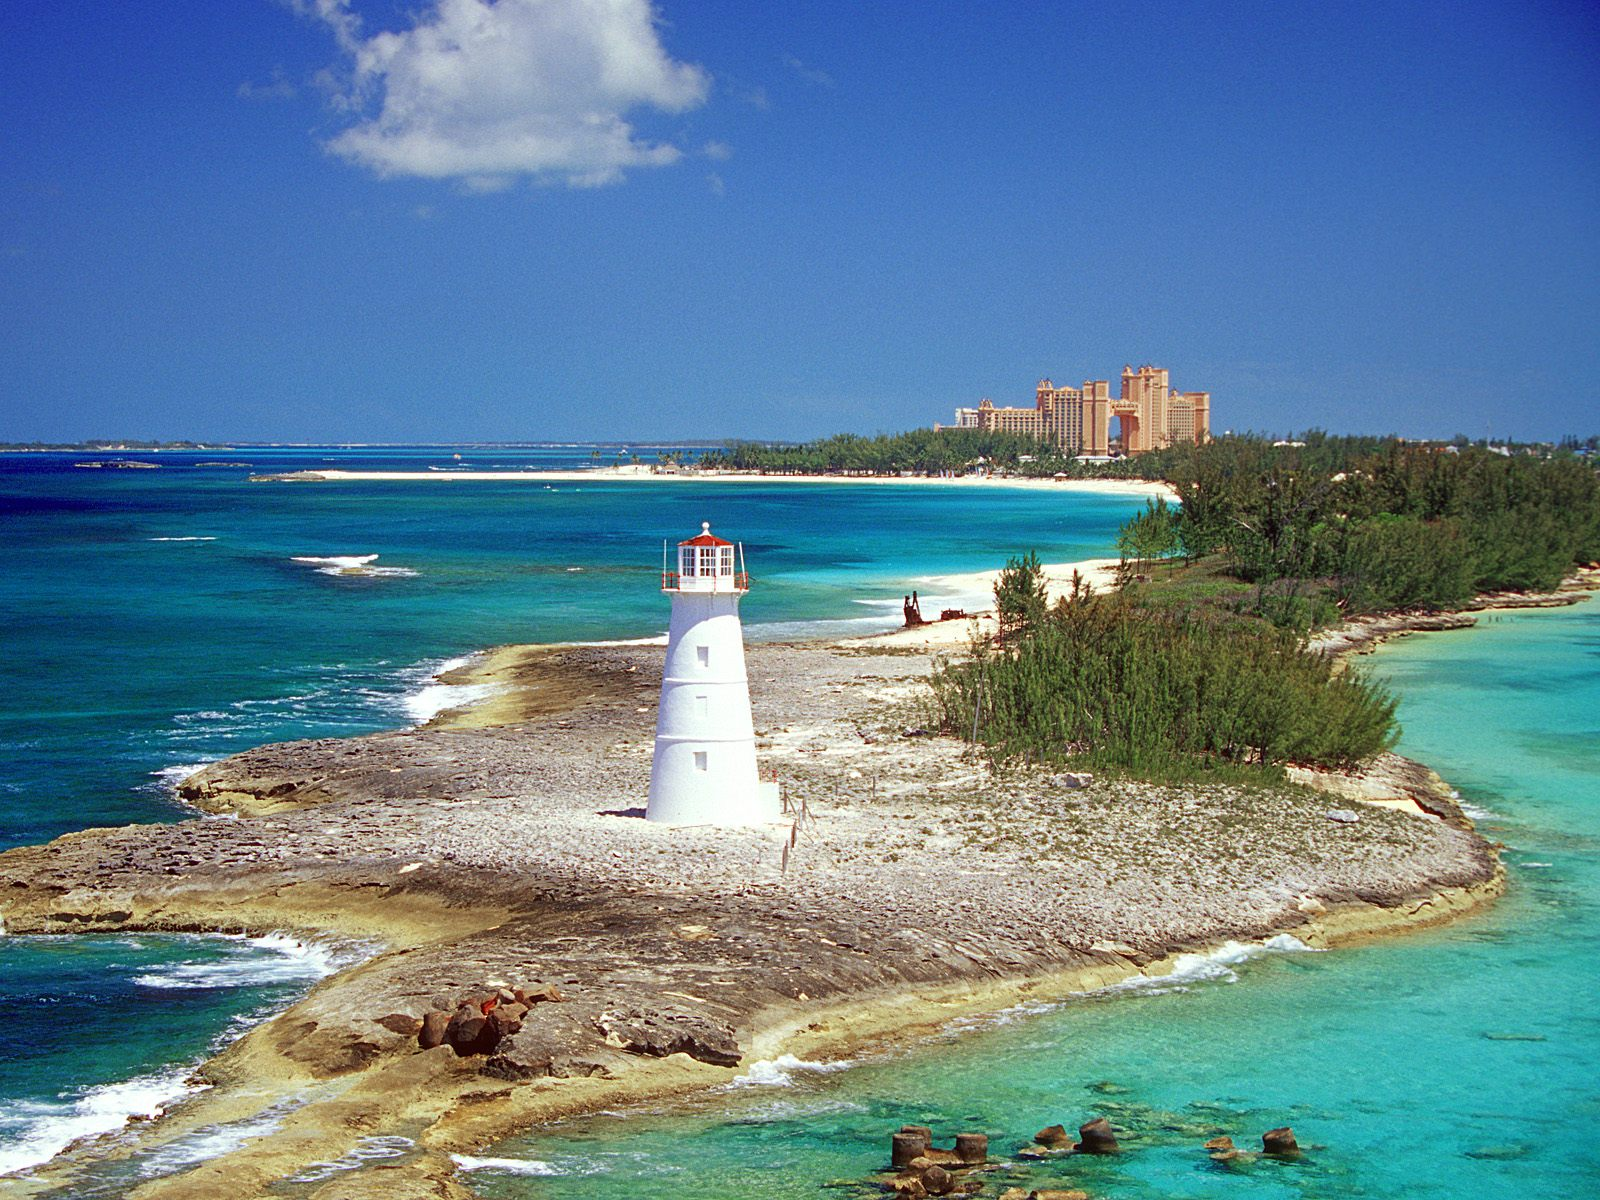 Island Nassau Bahamas Wallpaper High Quality WallpapersWallpaper 1600x1200